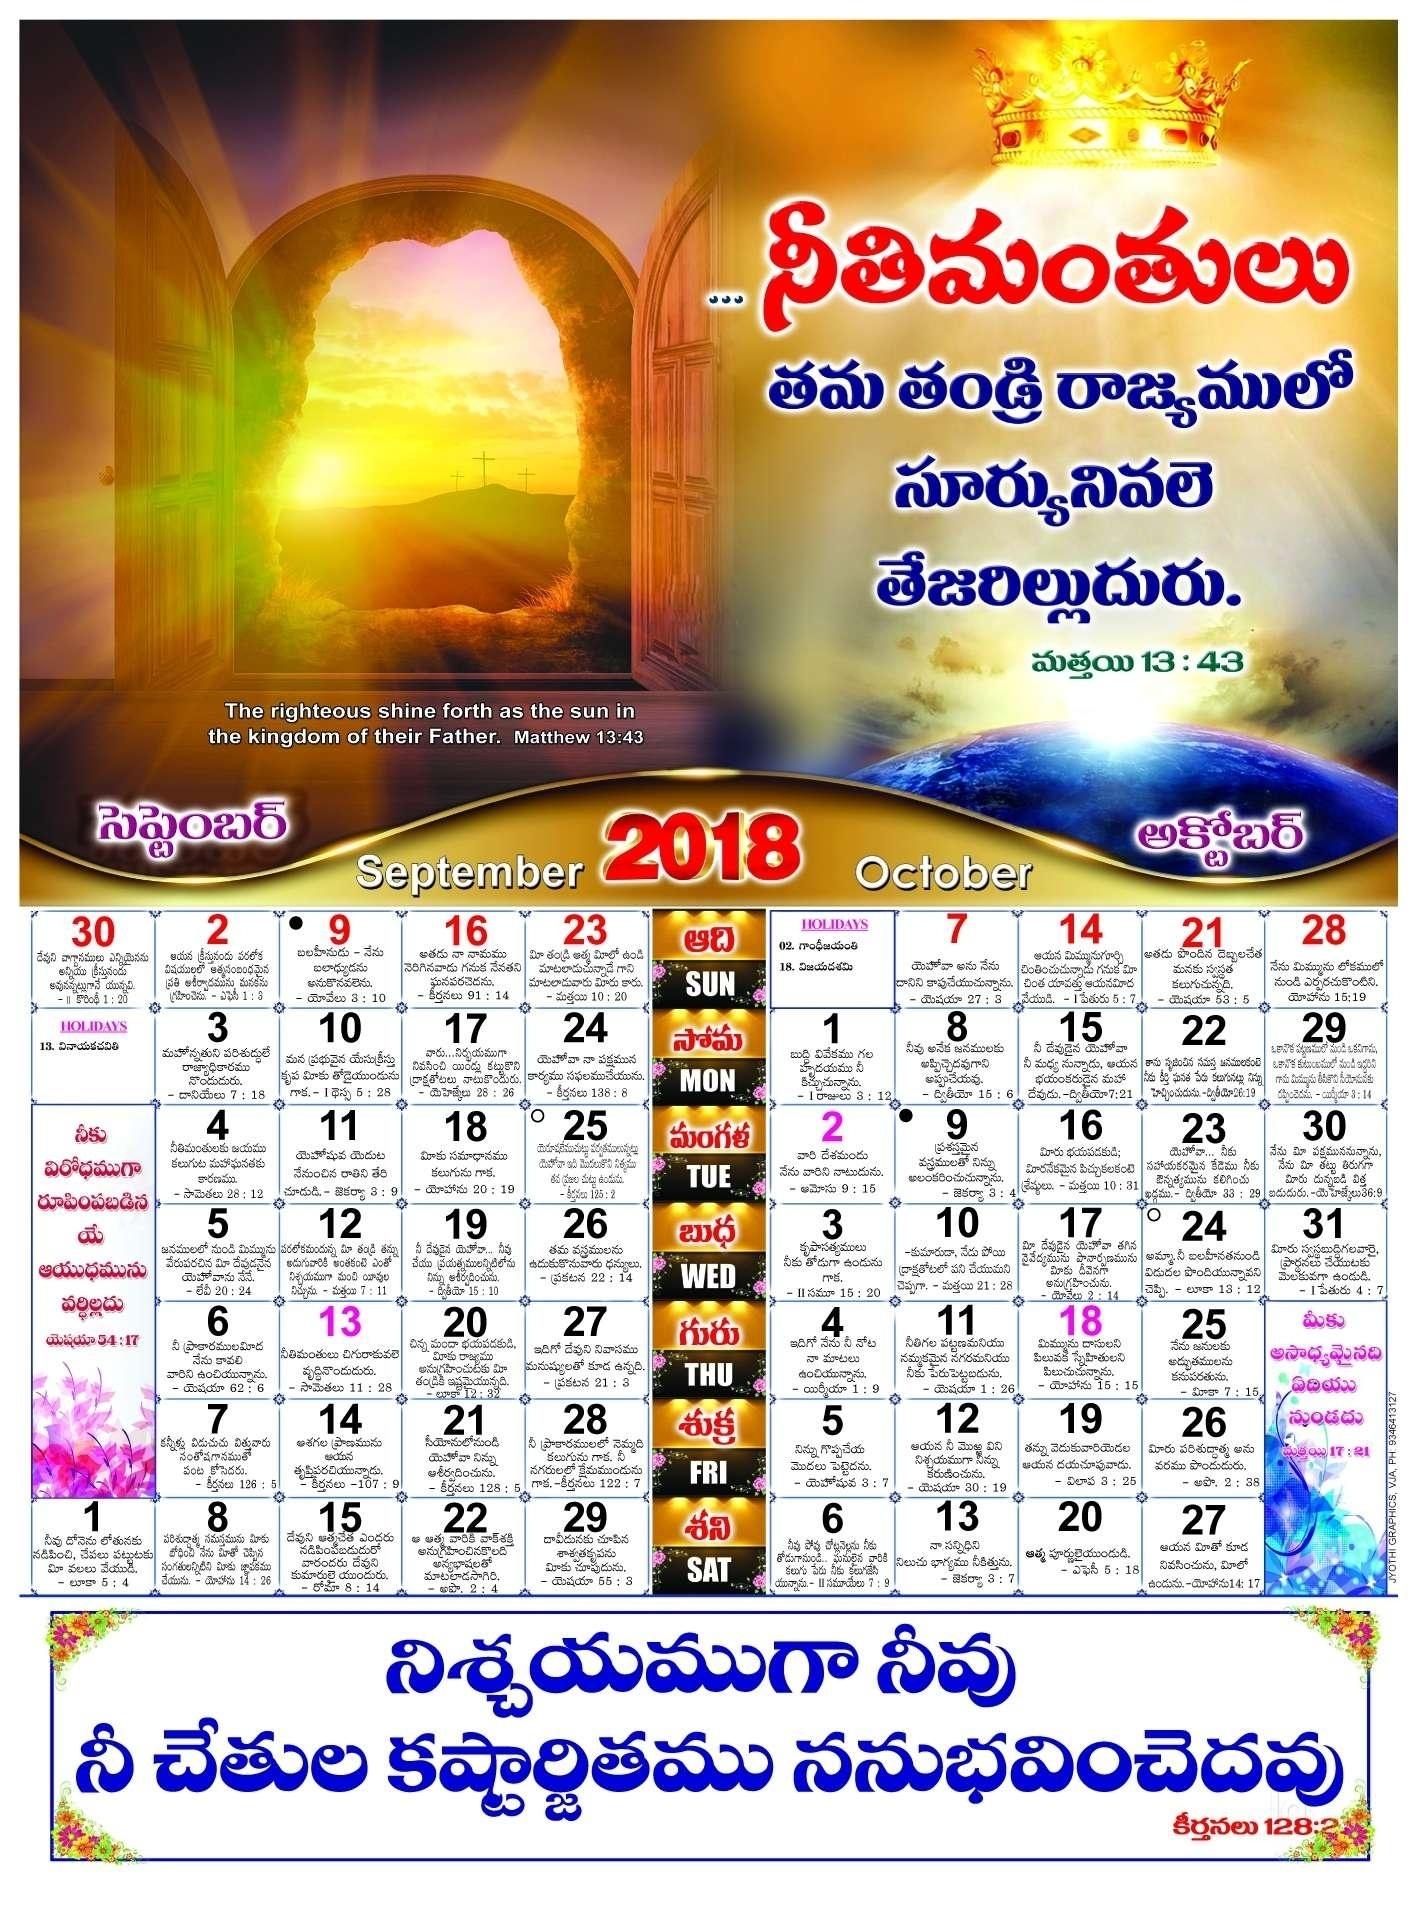 Calendar Printing Services In Vijayawada • Printable Blank Calendar_Calendar Printing Cost In Vijayawada